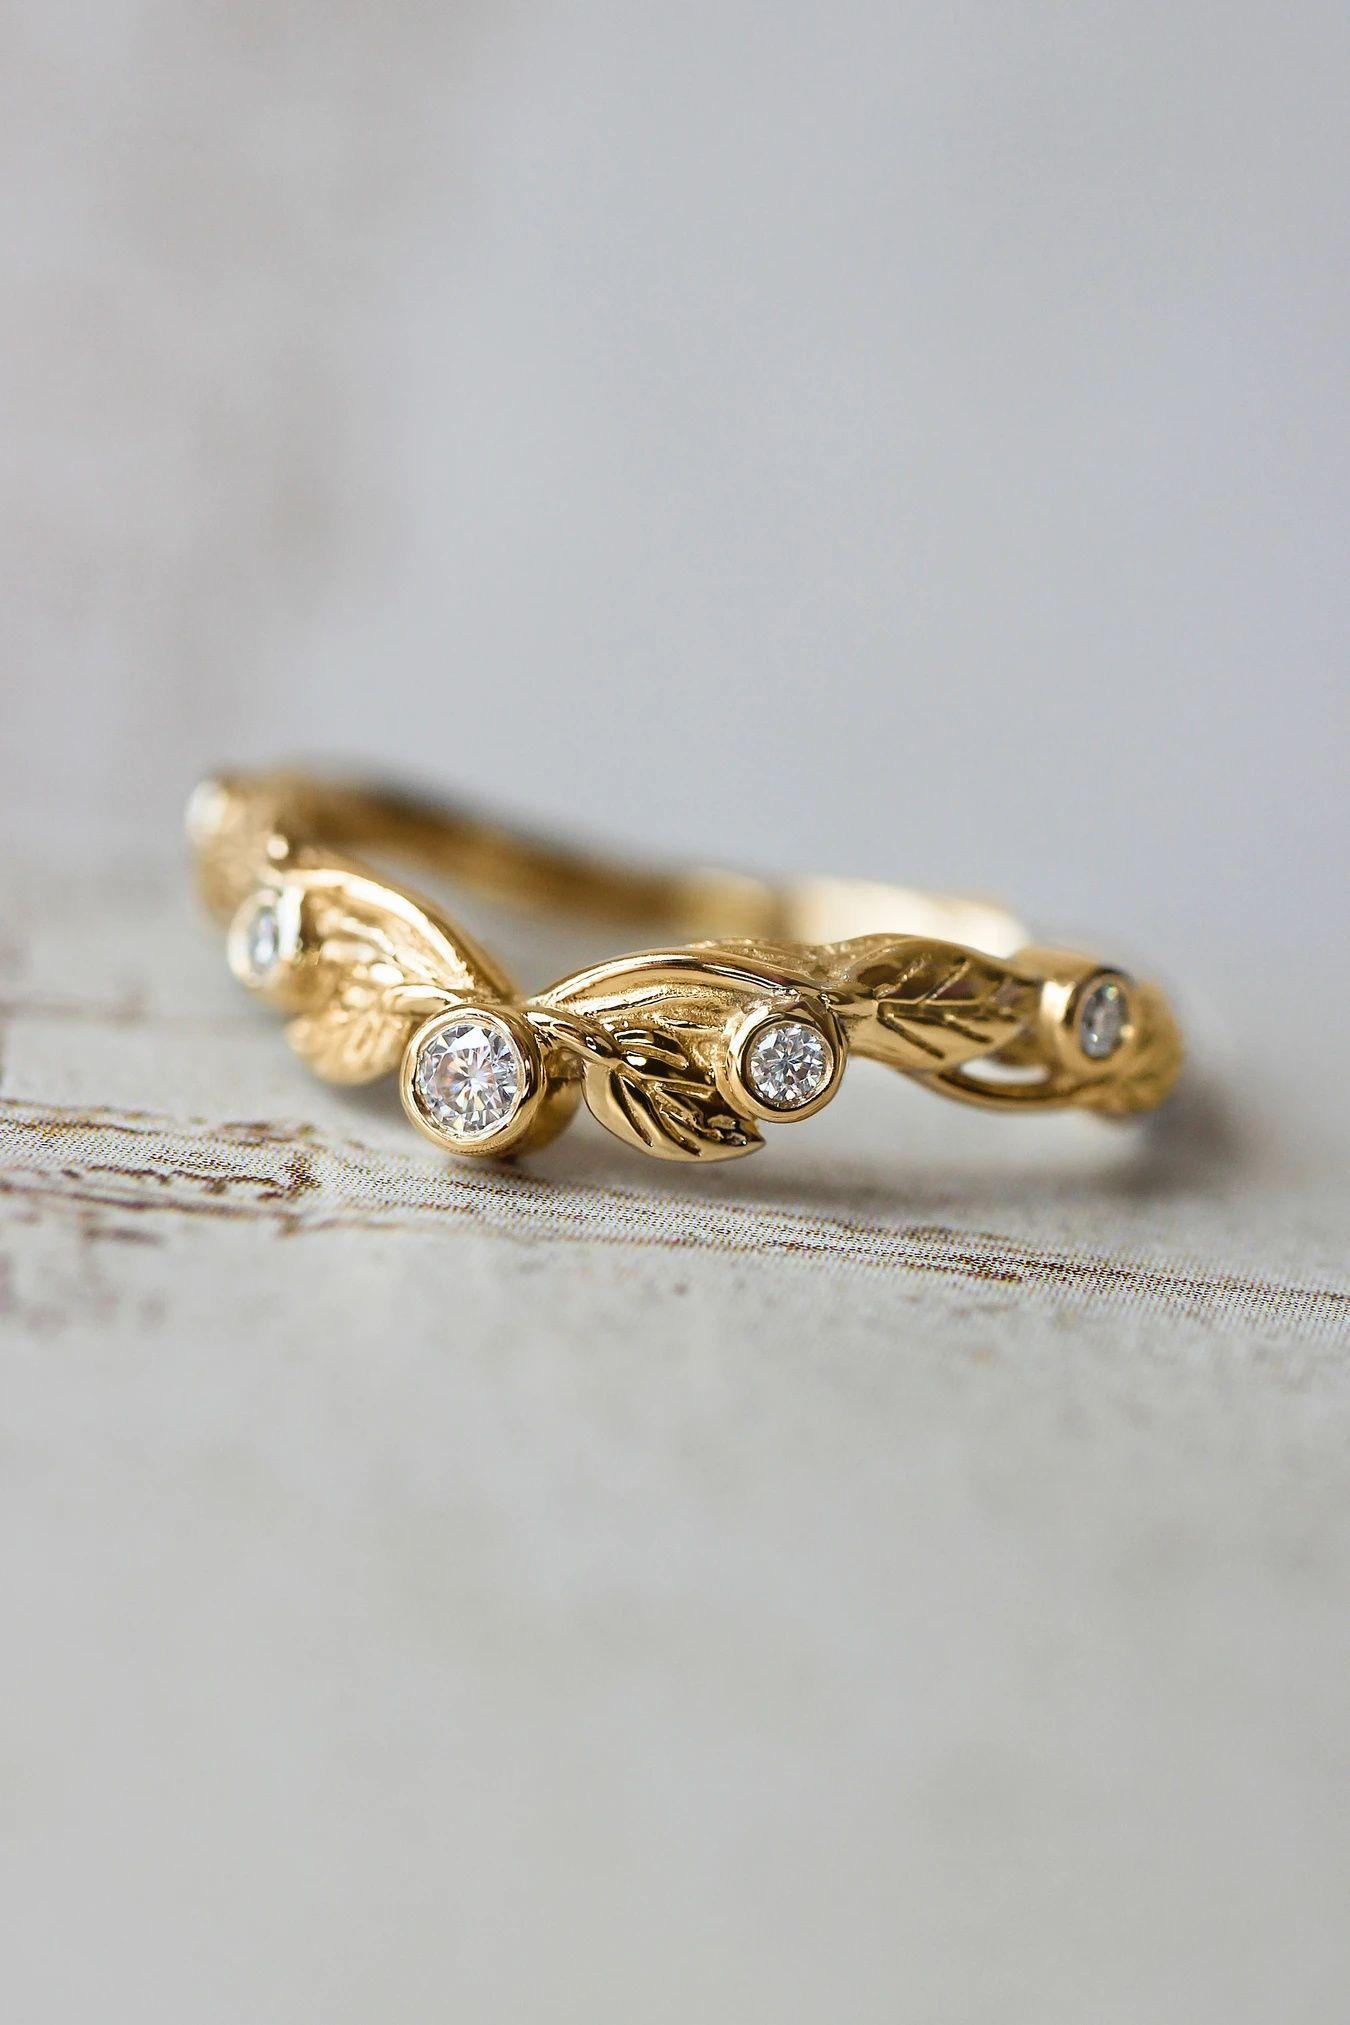 Wreath wedding band, leaf ring with diamonds or